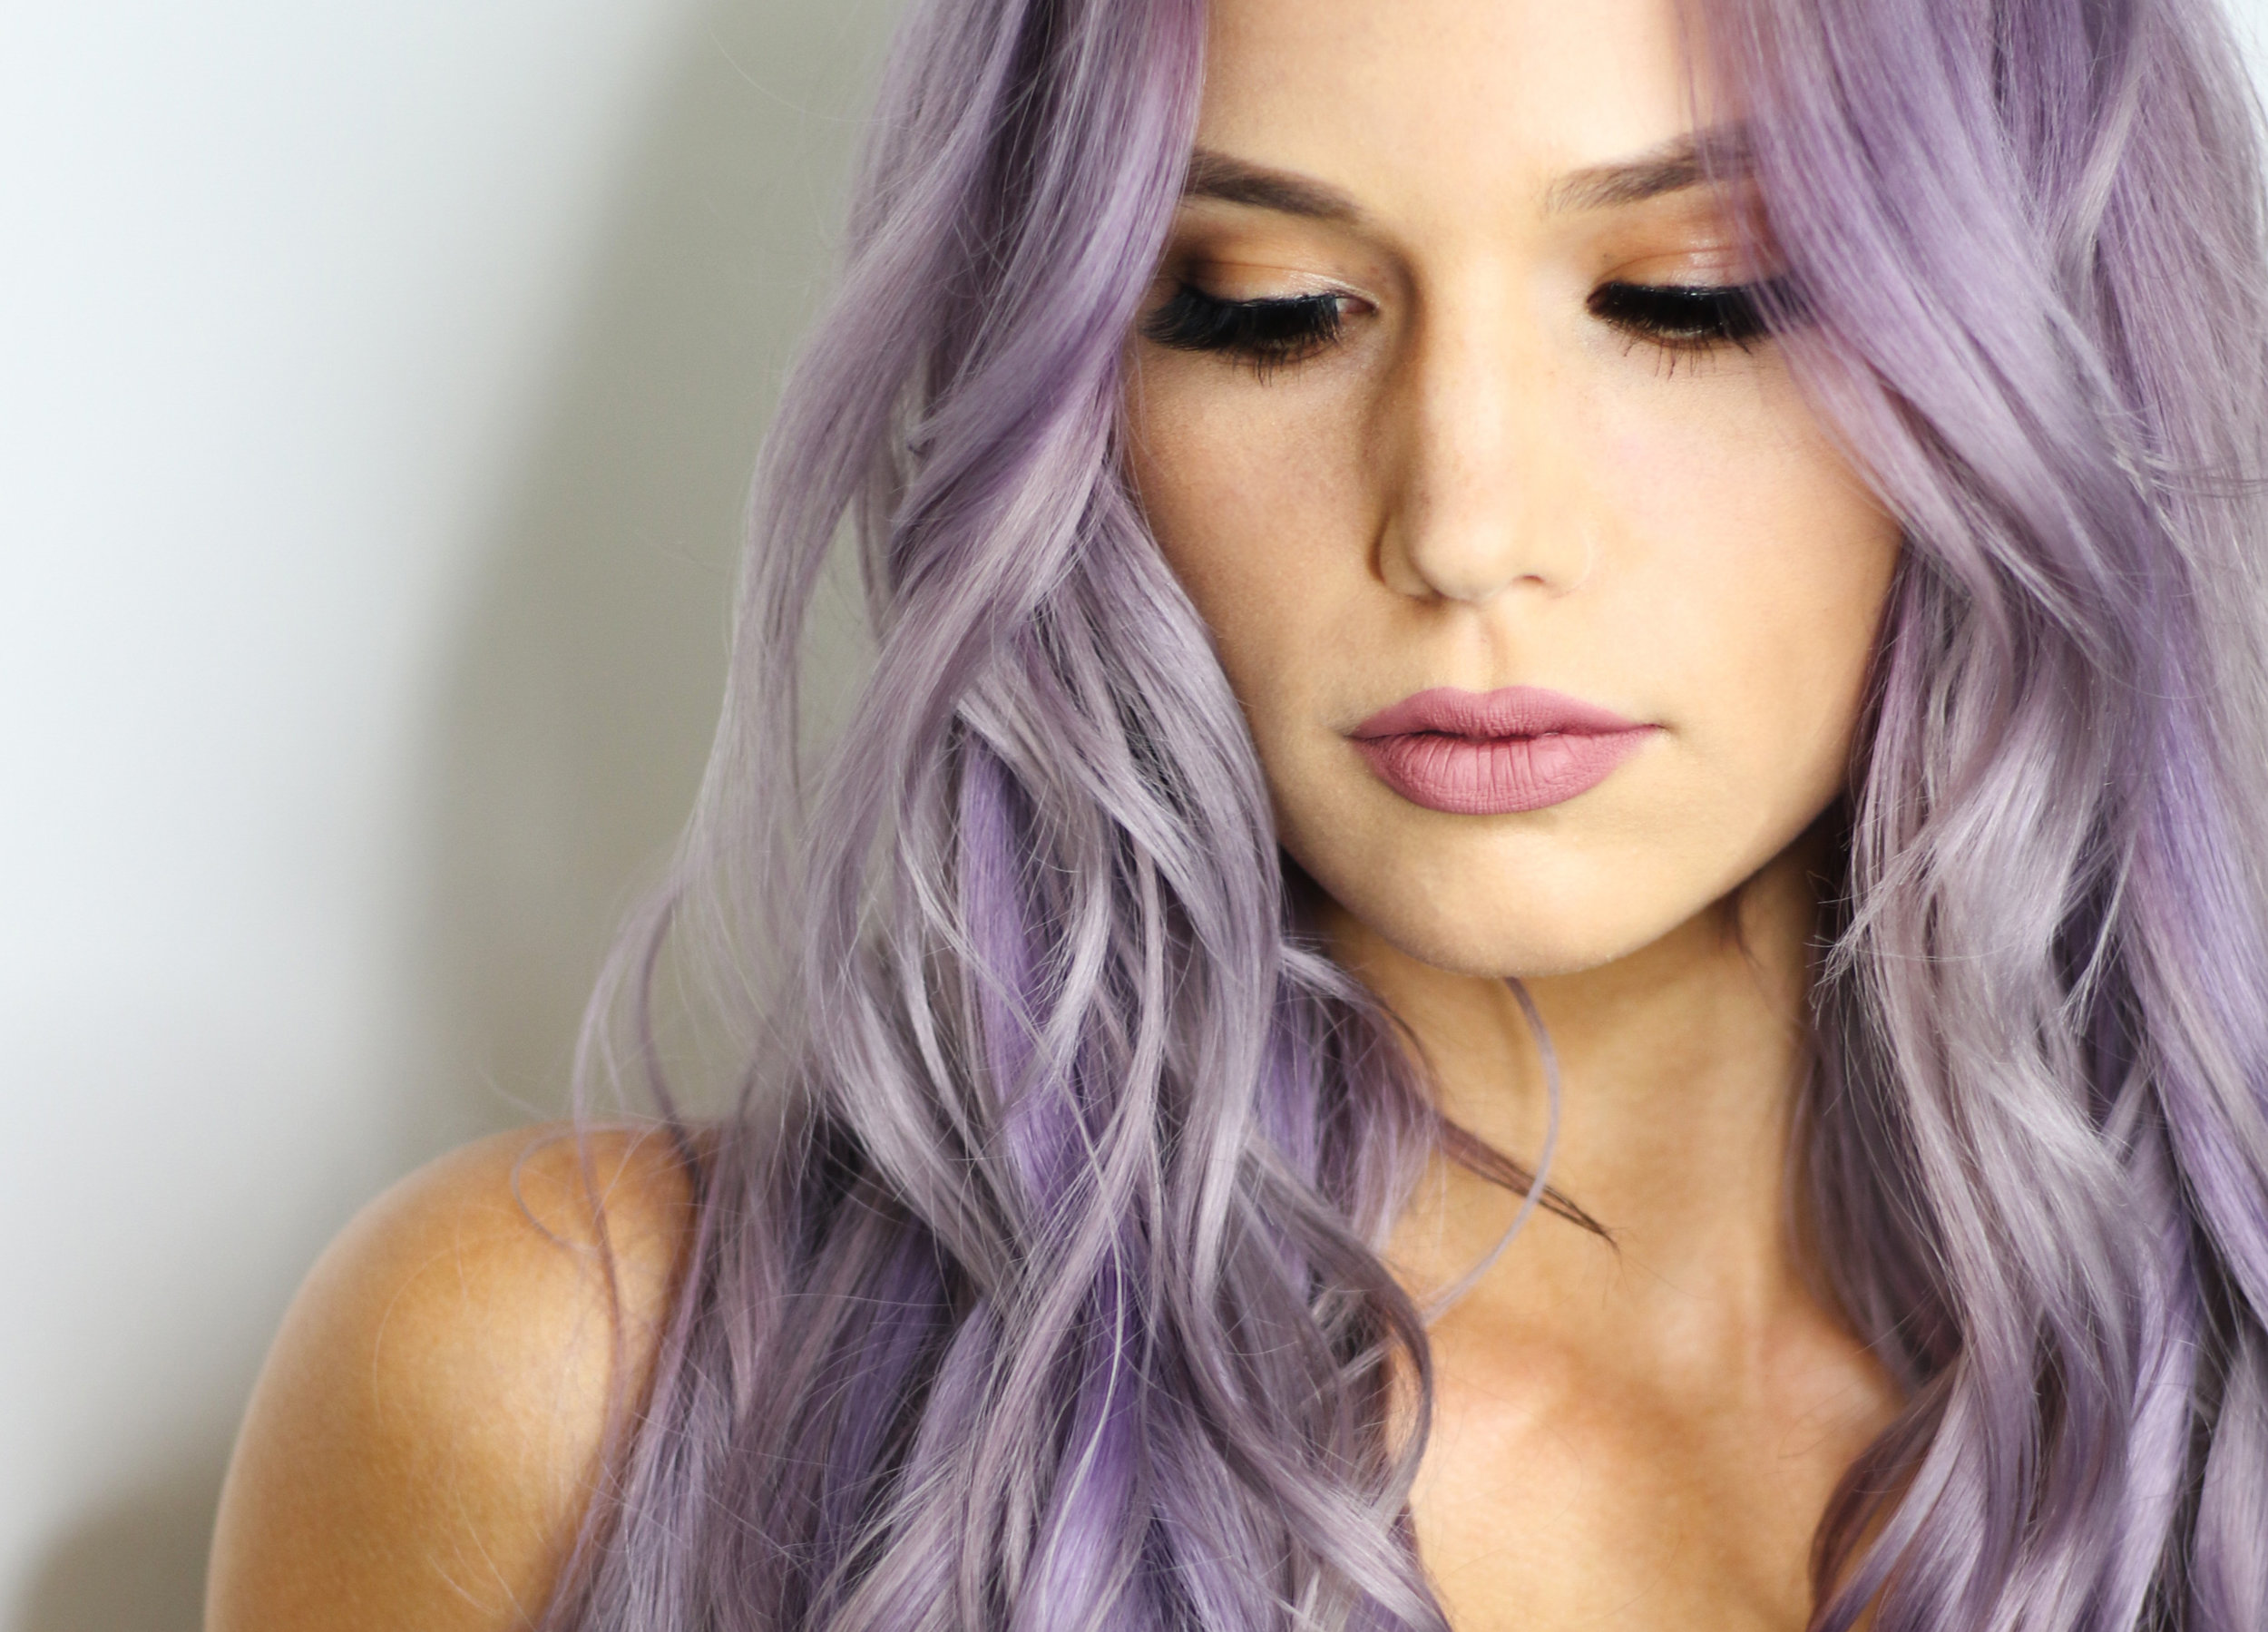 hair-purple-hairstyle-long-hair-black-hair-face-1397789-pxhere.com.jpg